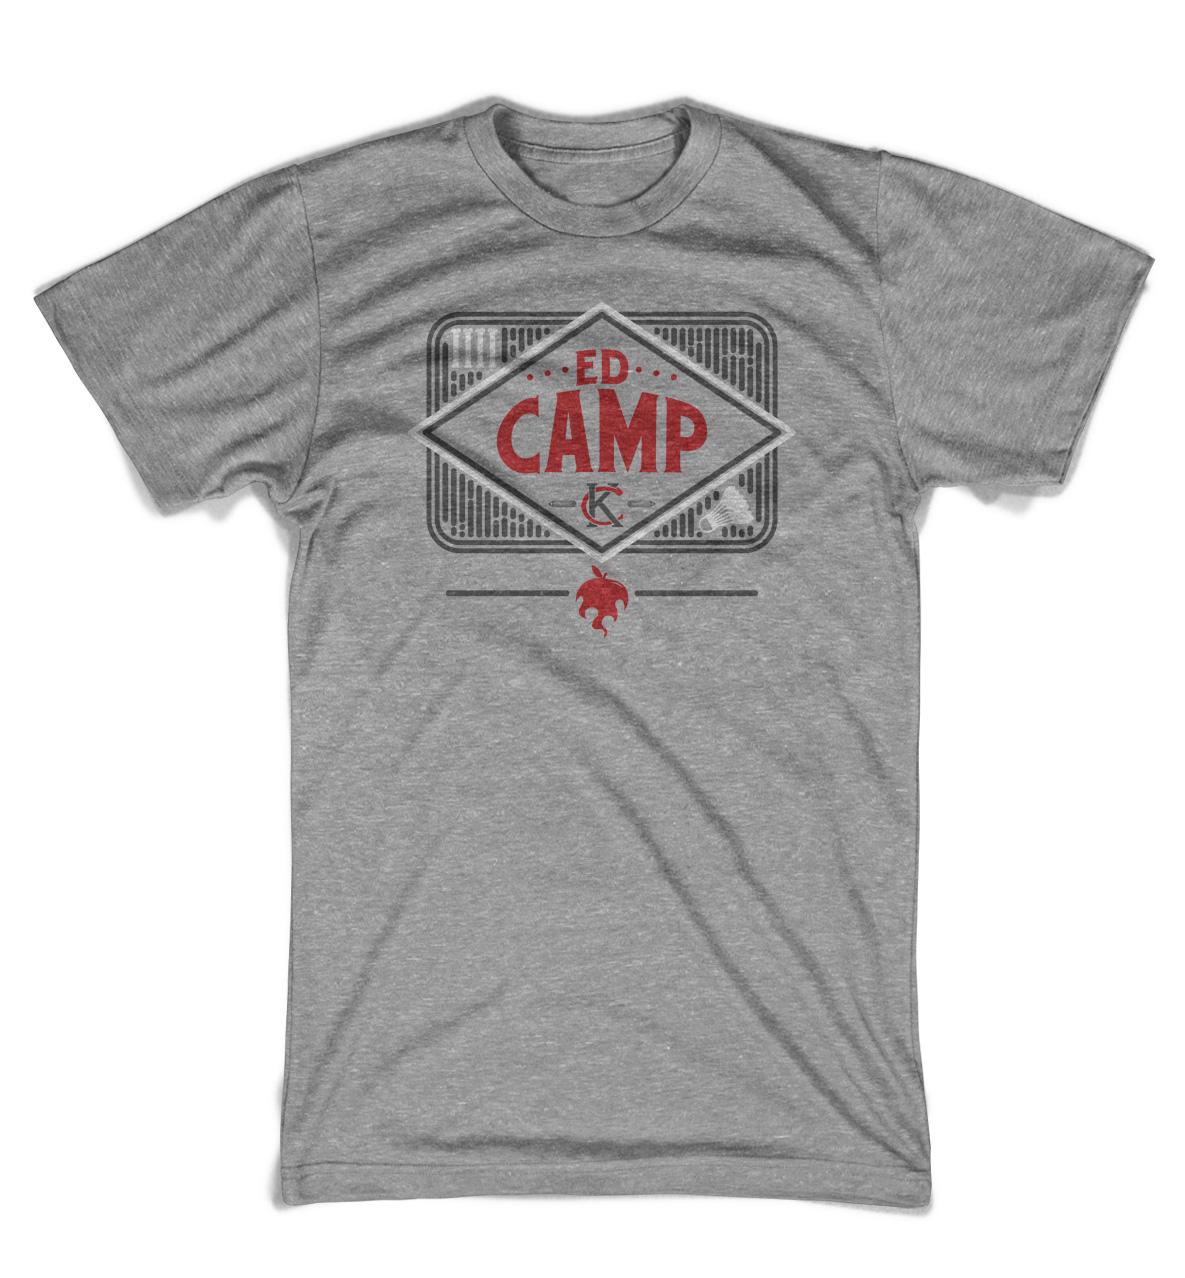 #EdcampKC Tshirt Final-MockUp